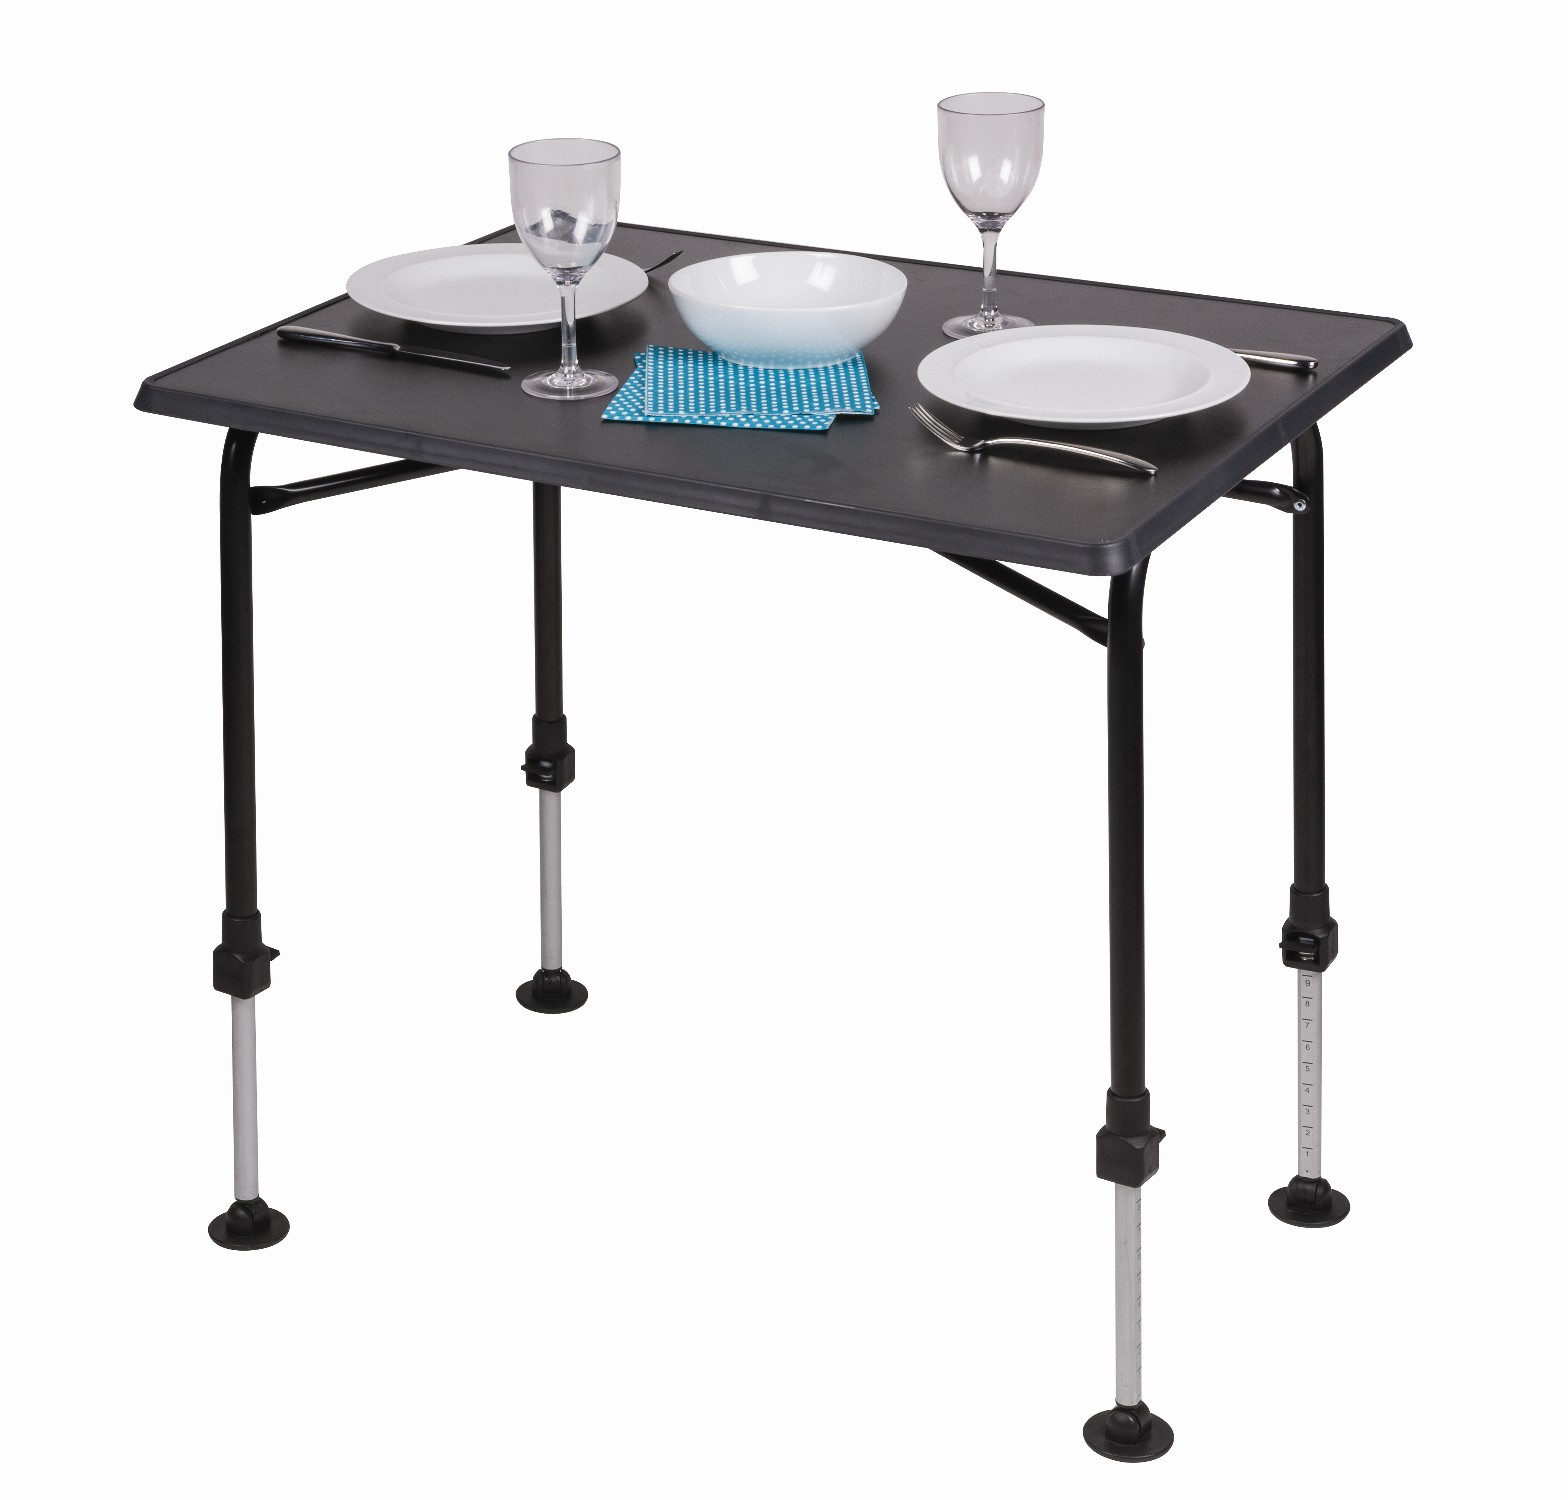 Kampa hi lo pro medium premium folding camping table with adjustable legs 5060444794250 ebay - Camping table adjustable height ...